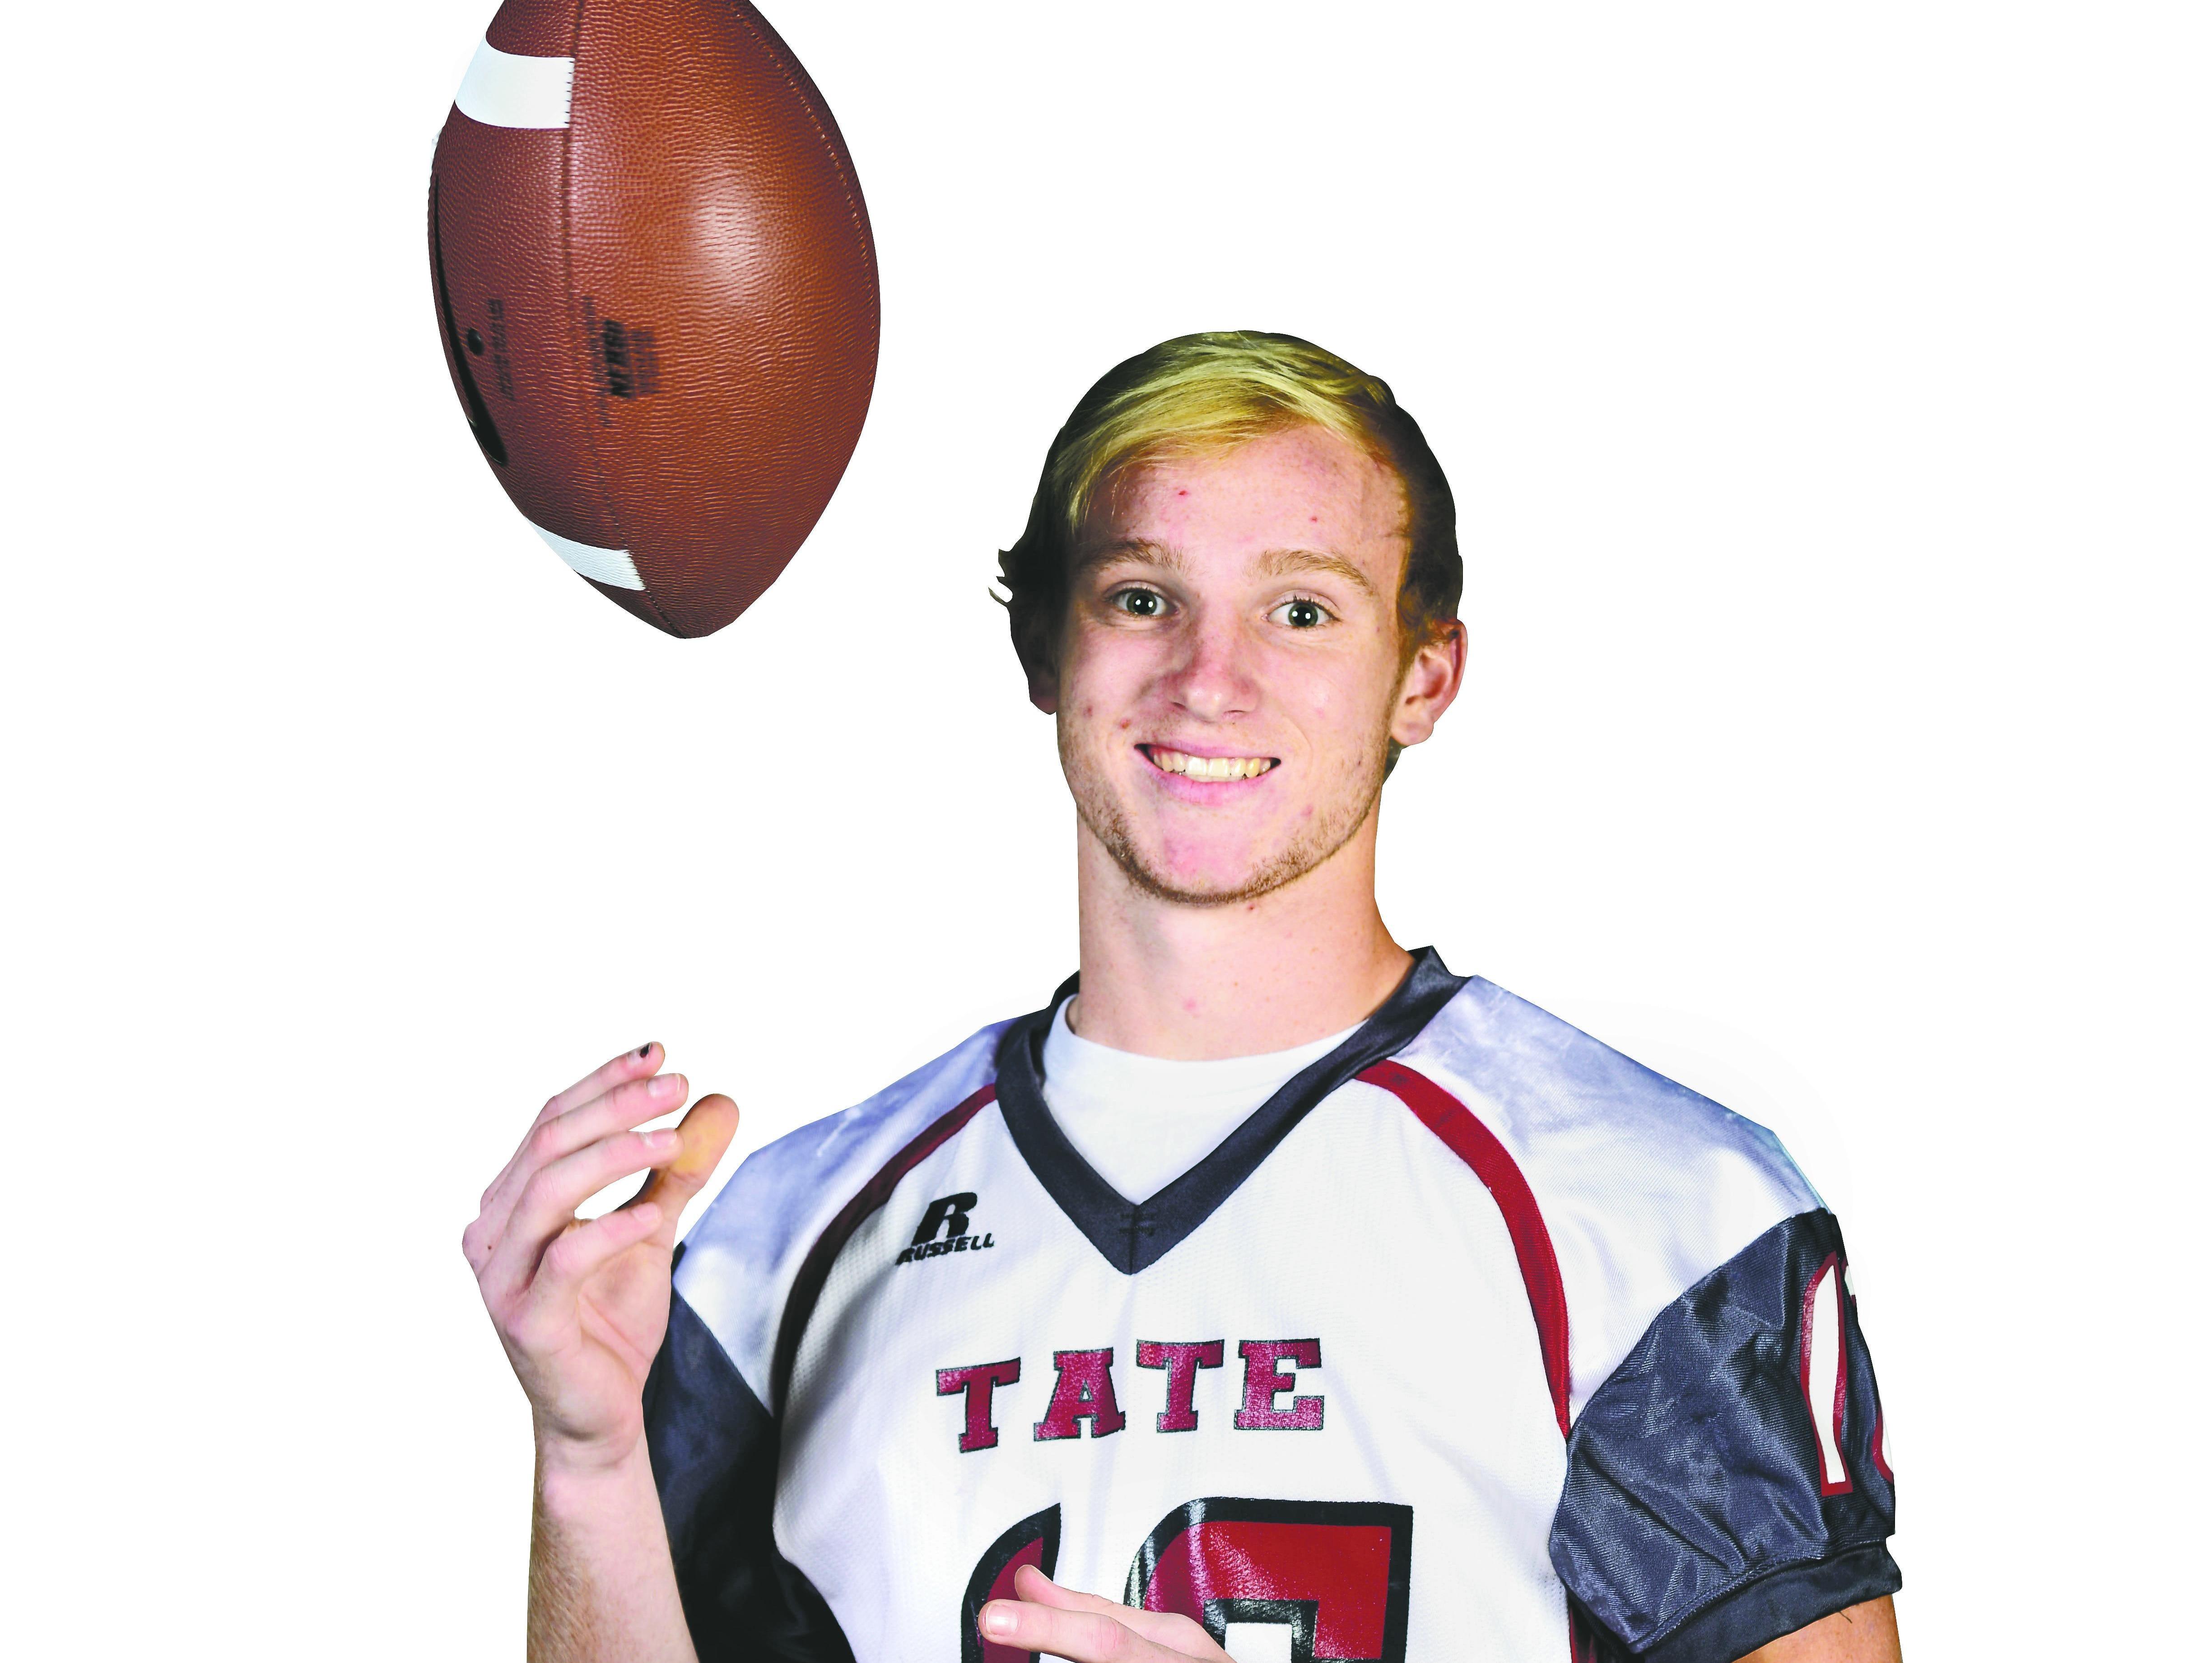 Jake Henry, Tate High School